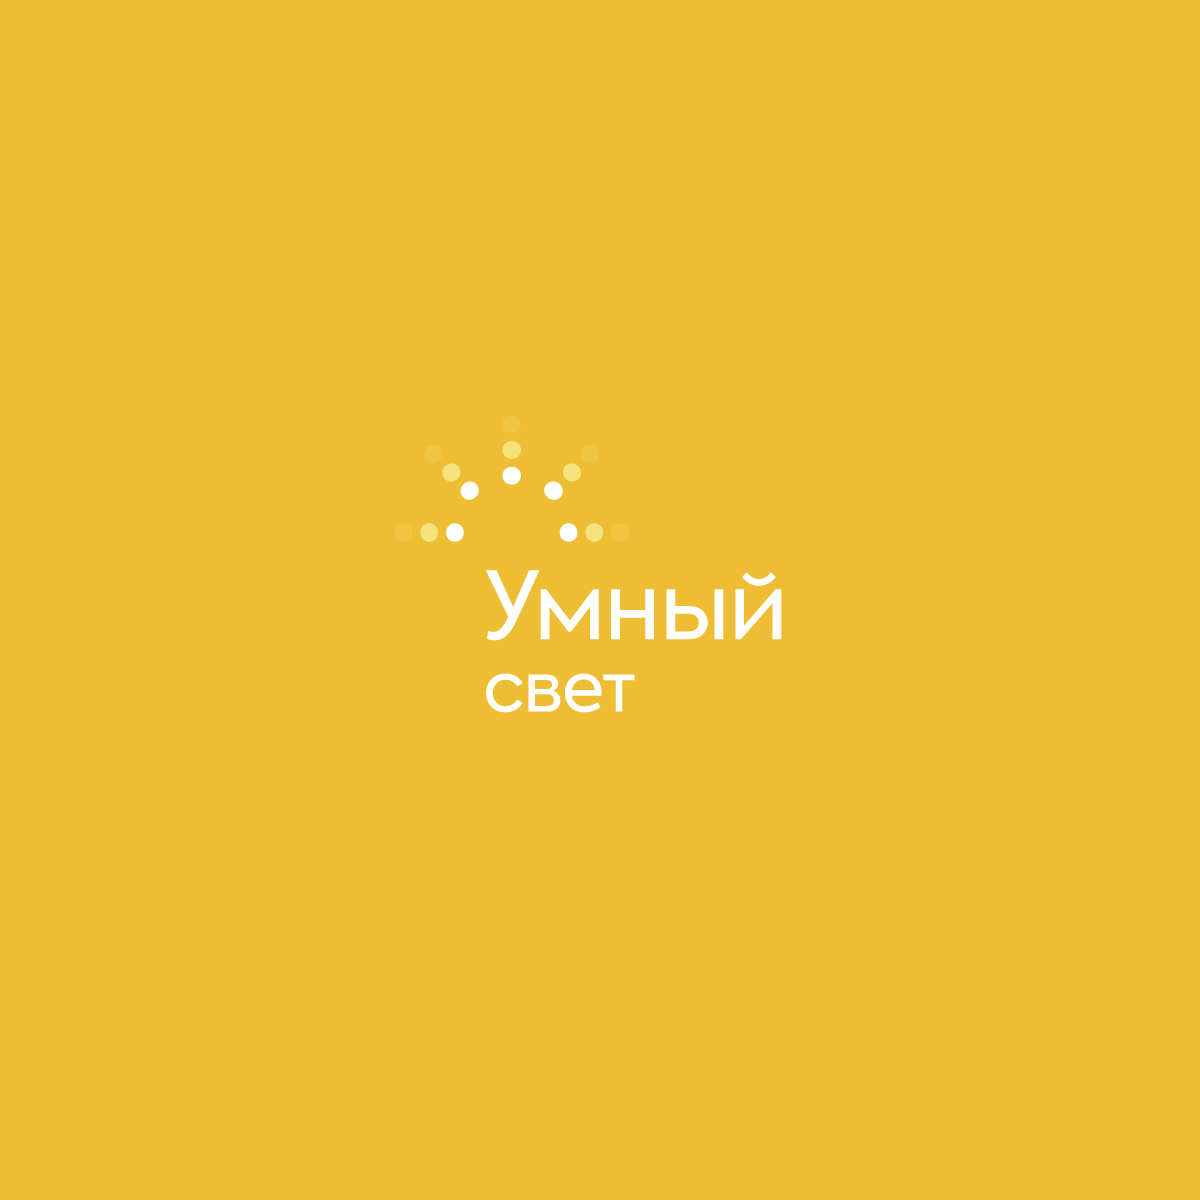 Логотип для салон-магазина освещения фото f_1905d00ede0524b3.jpg